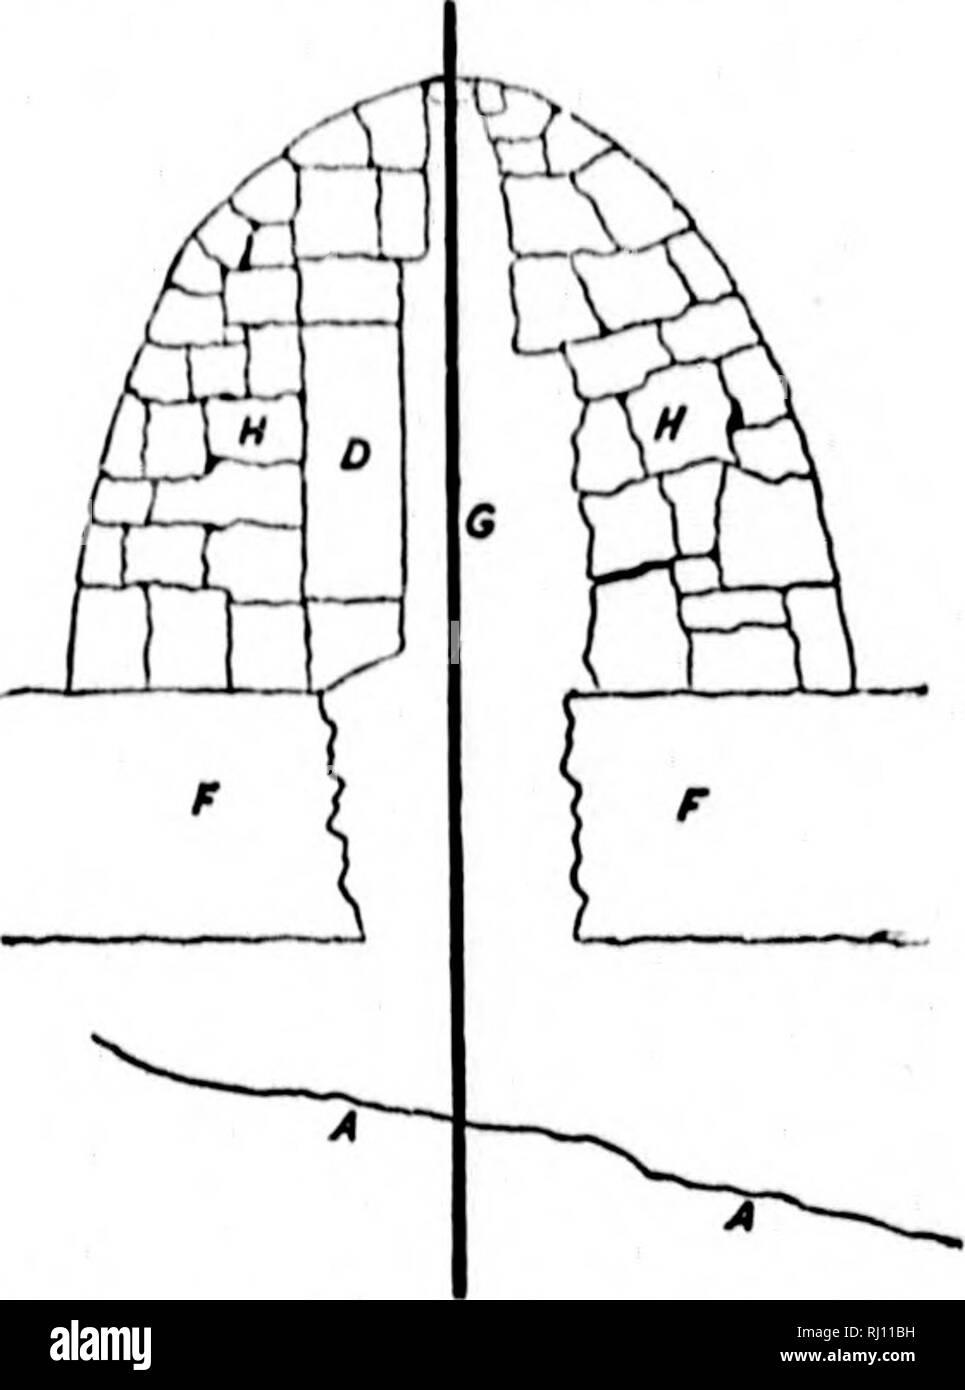 . Report on the proceedings of the United States expedition to Lady Franklin Bay, Grinnell Land [microform] . Tides; Meteorology; Meteorology; Zoology; Botany; Magnetism, Terrestrial; Astronomy; Astronomy; Gravity; Marées; Météorologie; ; ; ; ; ; ; . (.. (liiiiKi' Nil. II ; .1.1, itifl liiinl liiiiluni ; /, lion litnk. sx is i d ii. liUfd wiili slum; 1 .s, I.om: slum: Im'.iress; /'. wiili' .'-mill uak pUiiik. l nf ih,' iinrlli iii'l nf lliu main â italiiMi bmliliiin. Tlu' relerciicc |ioiiit in tliv Ivvi'l ti>|i iif a li.ir or irm, which, hating a (Imilile Qti»» ( 1 I ) n Ihu M)iilh  - Stock Image